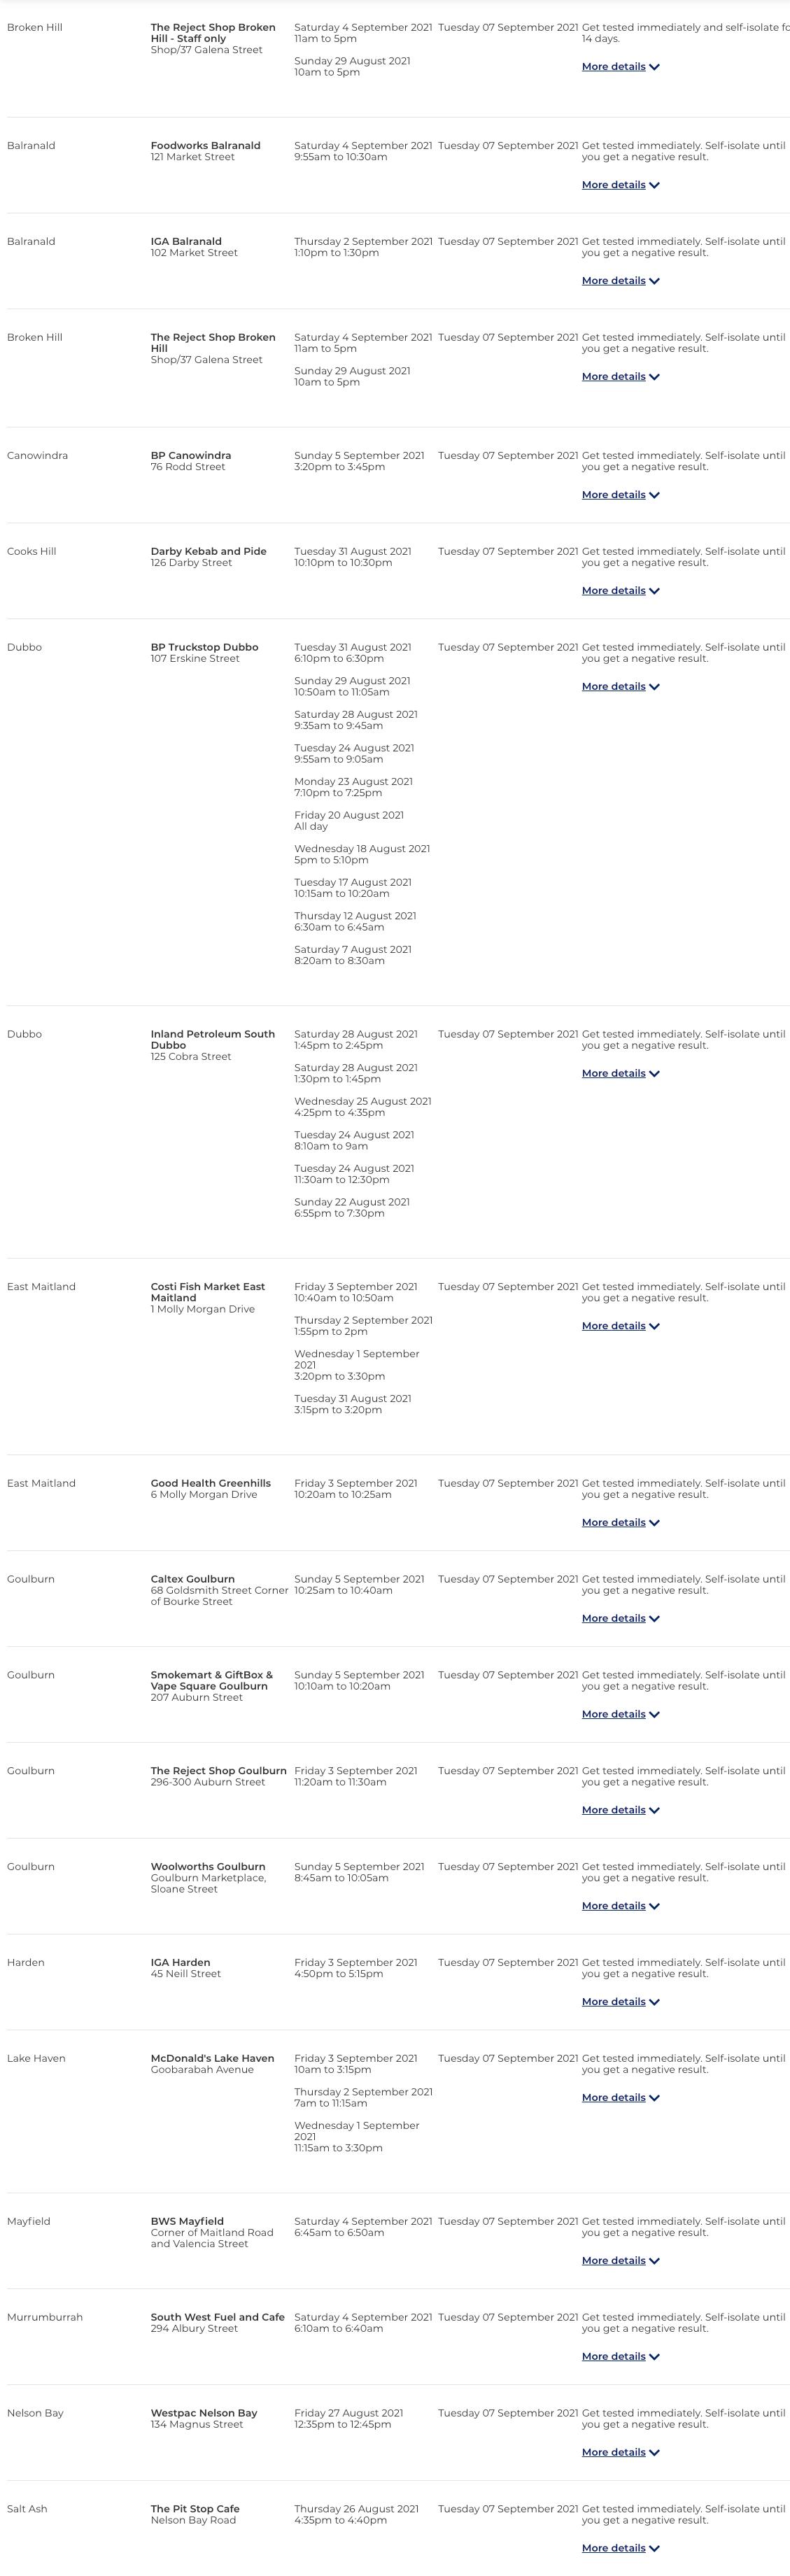 www.nsw.gov.au_covid-19_nsw-covid-19-case-locations_case-locations (16).png